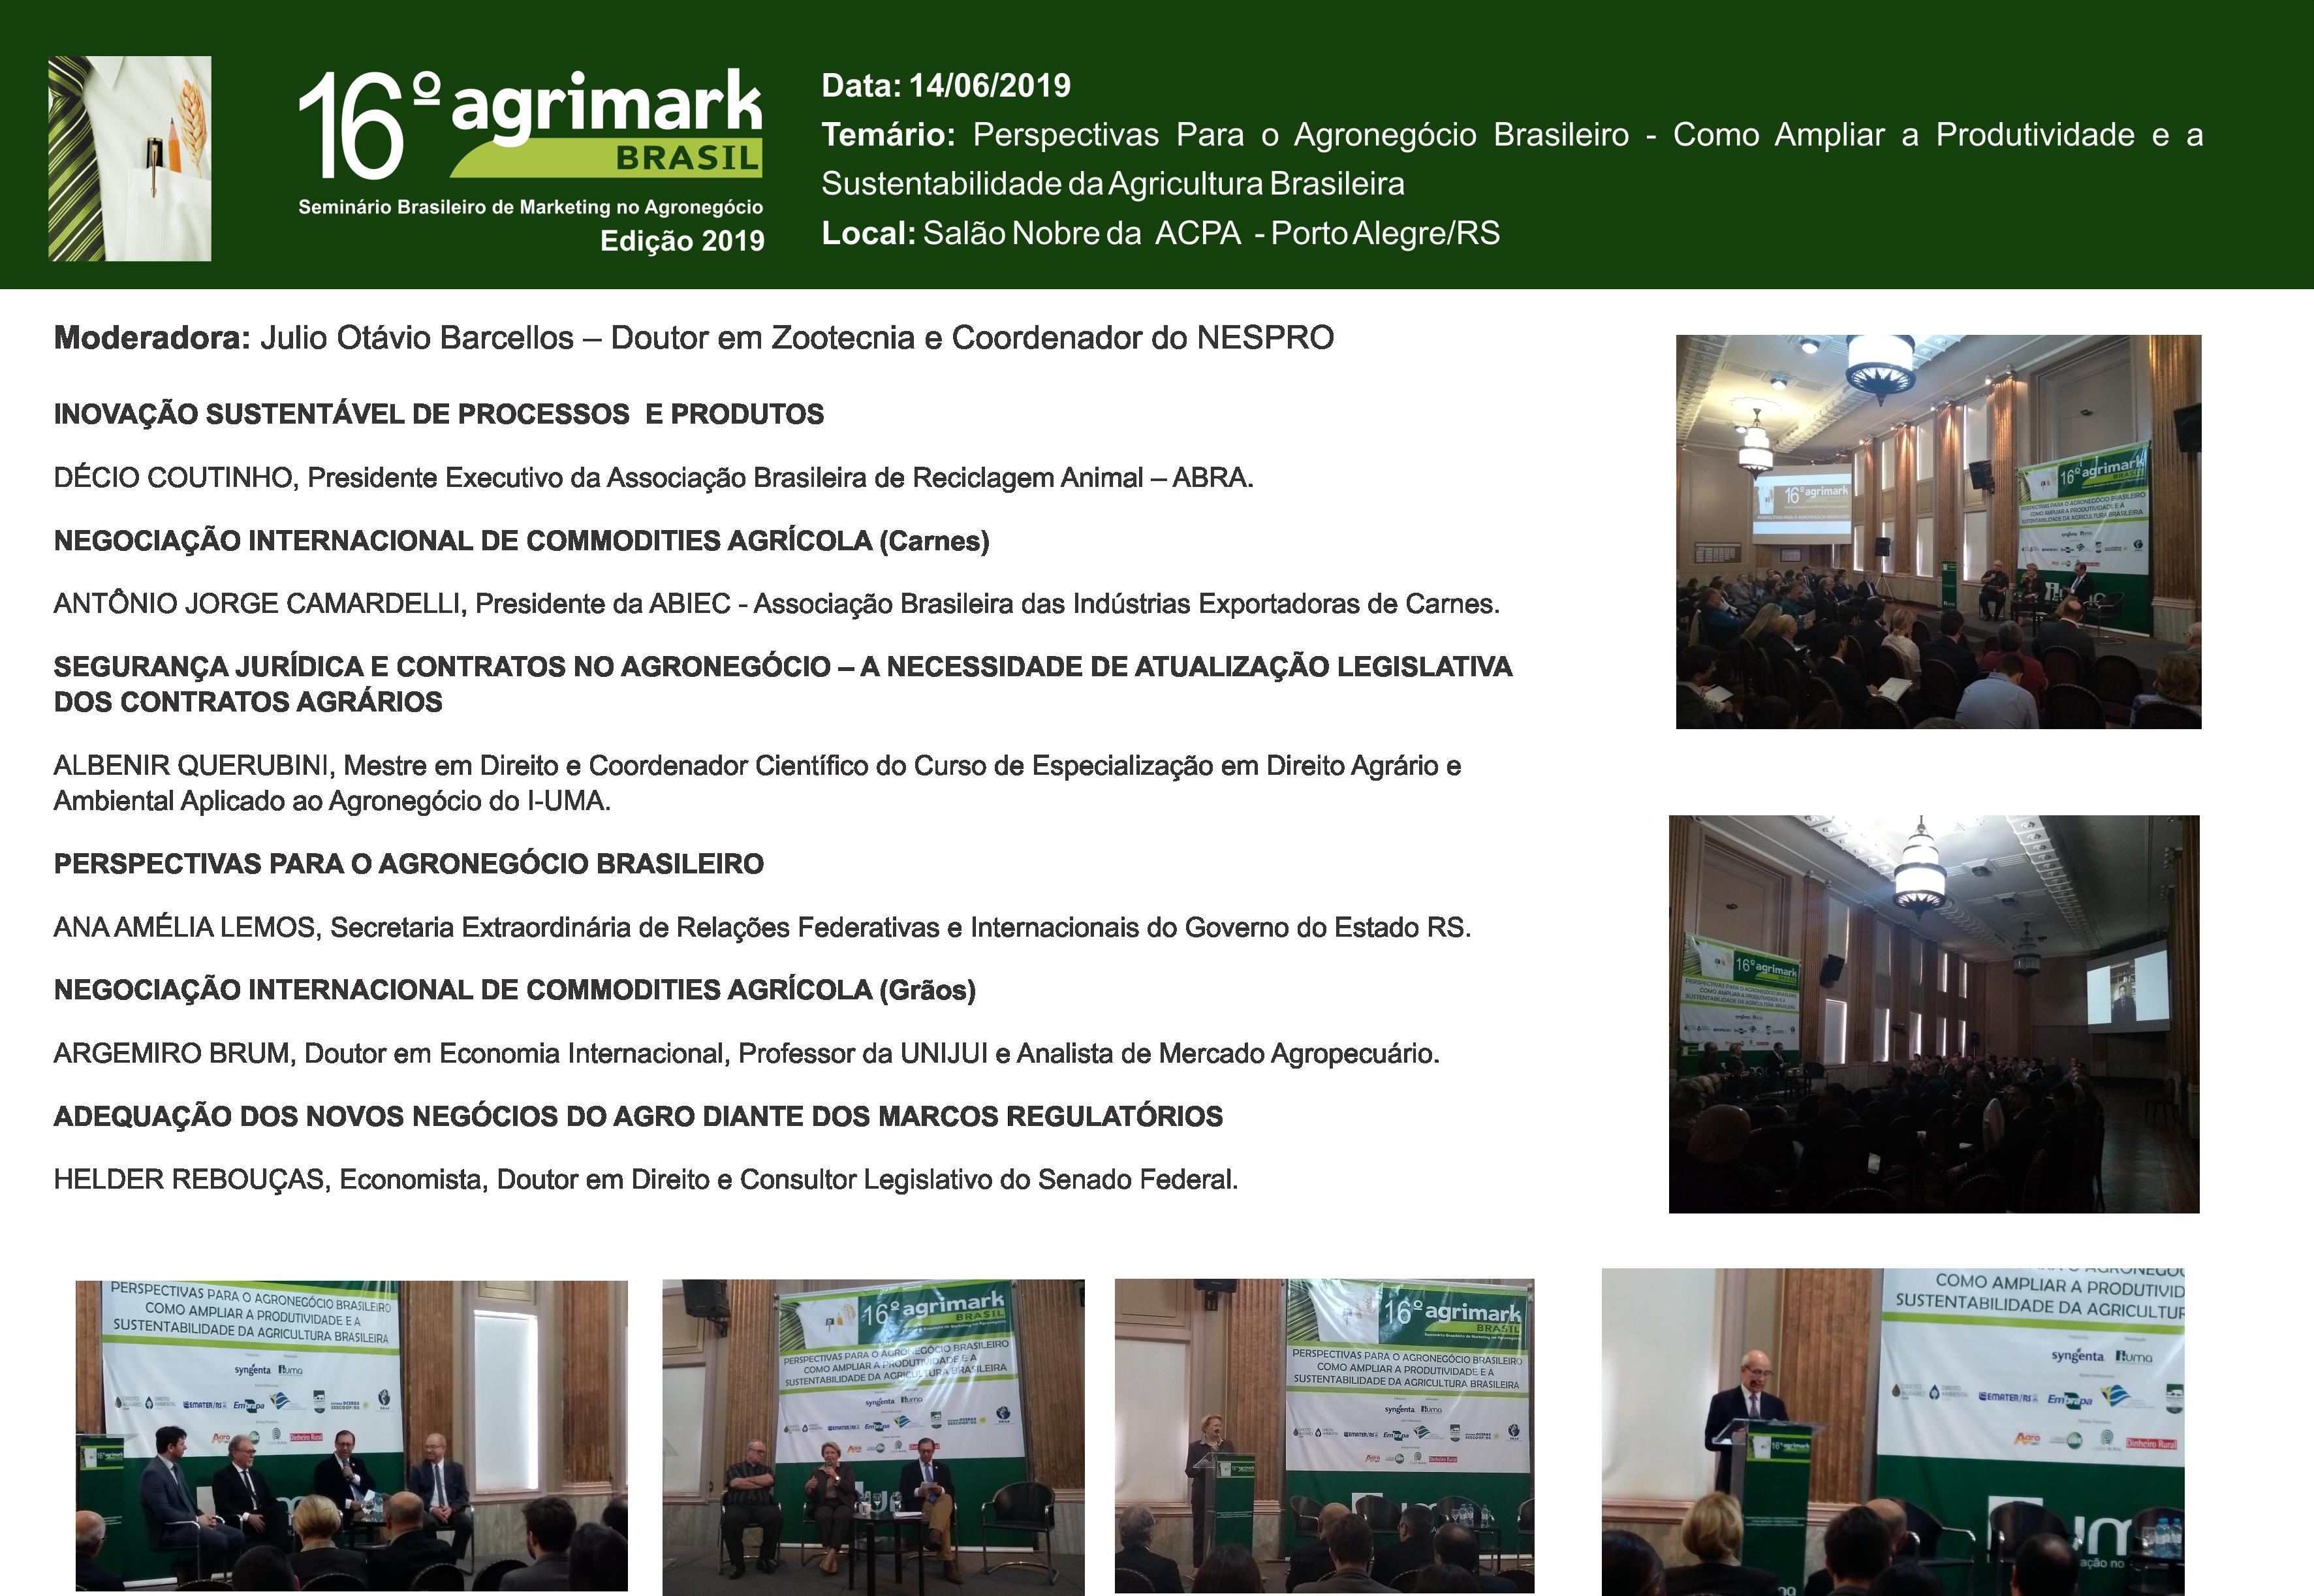 Edições anteriores Agrimark  - 16º